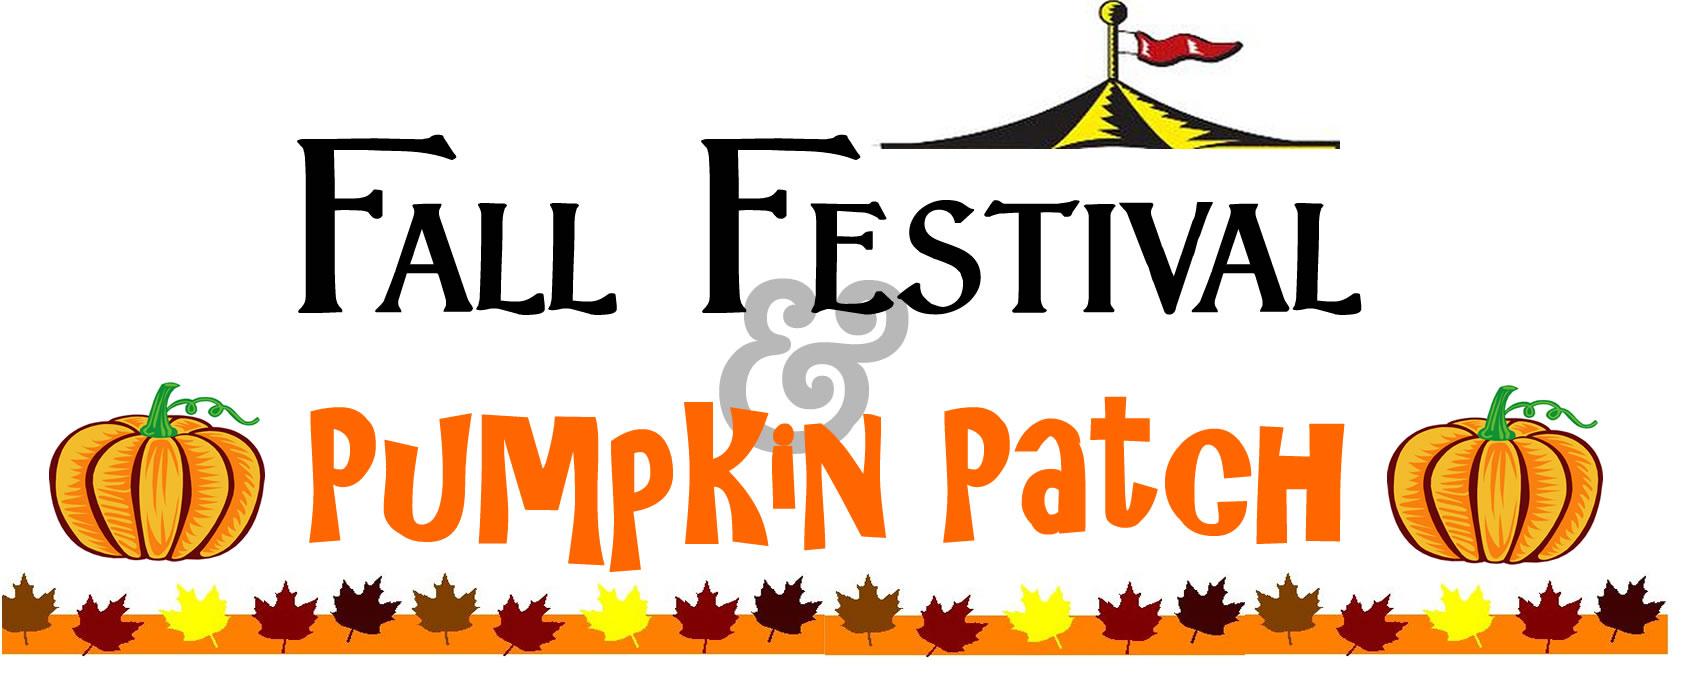 Fall Festival Clipart-fall festival clipart-2